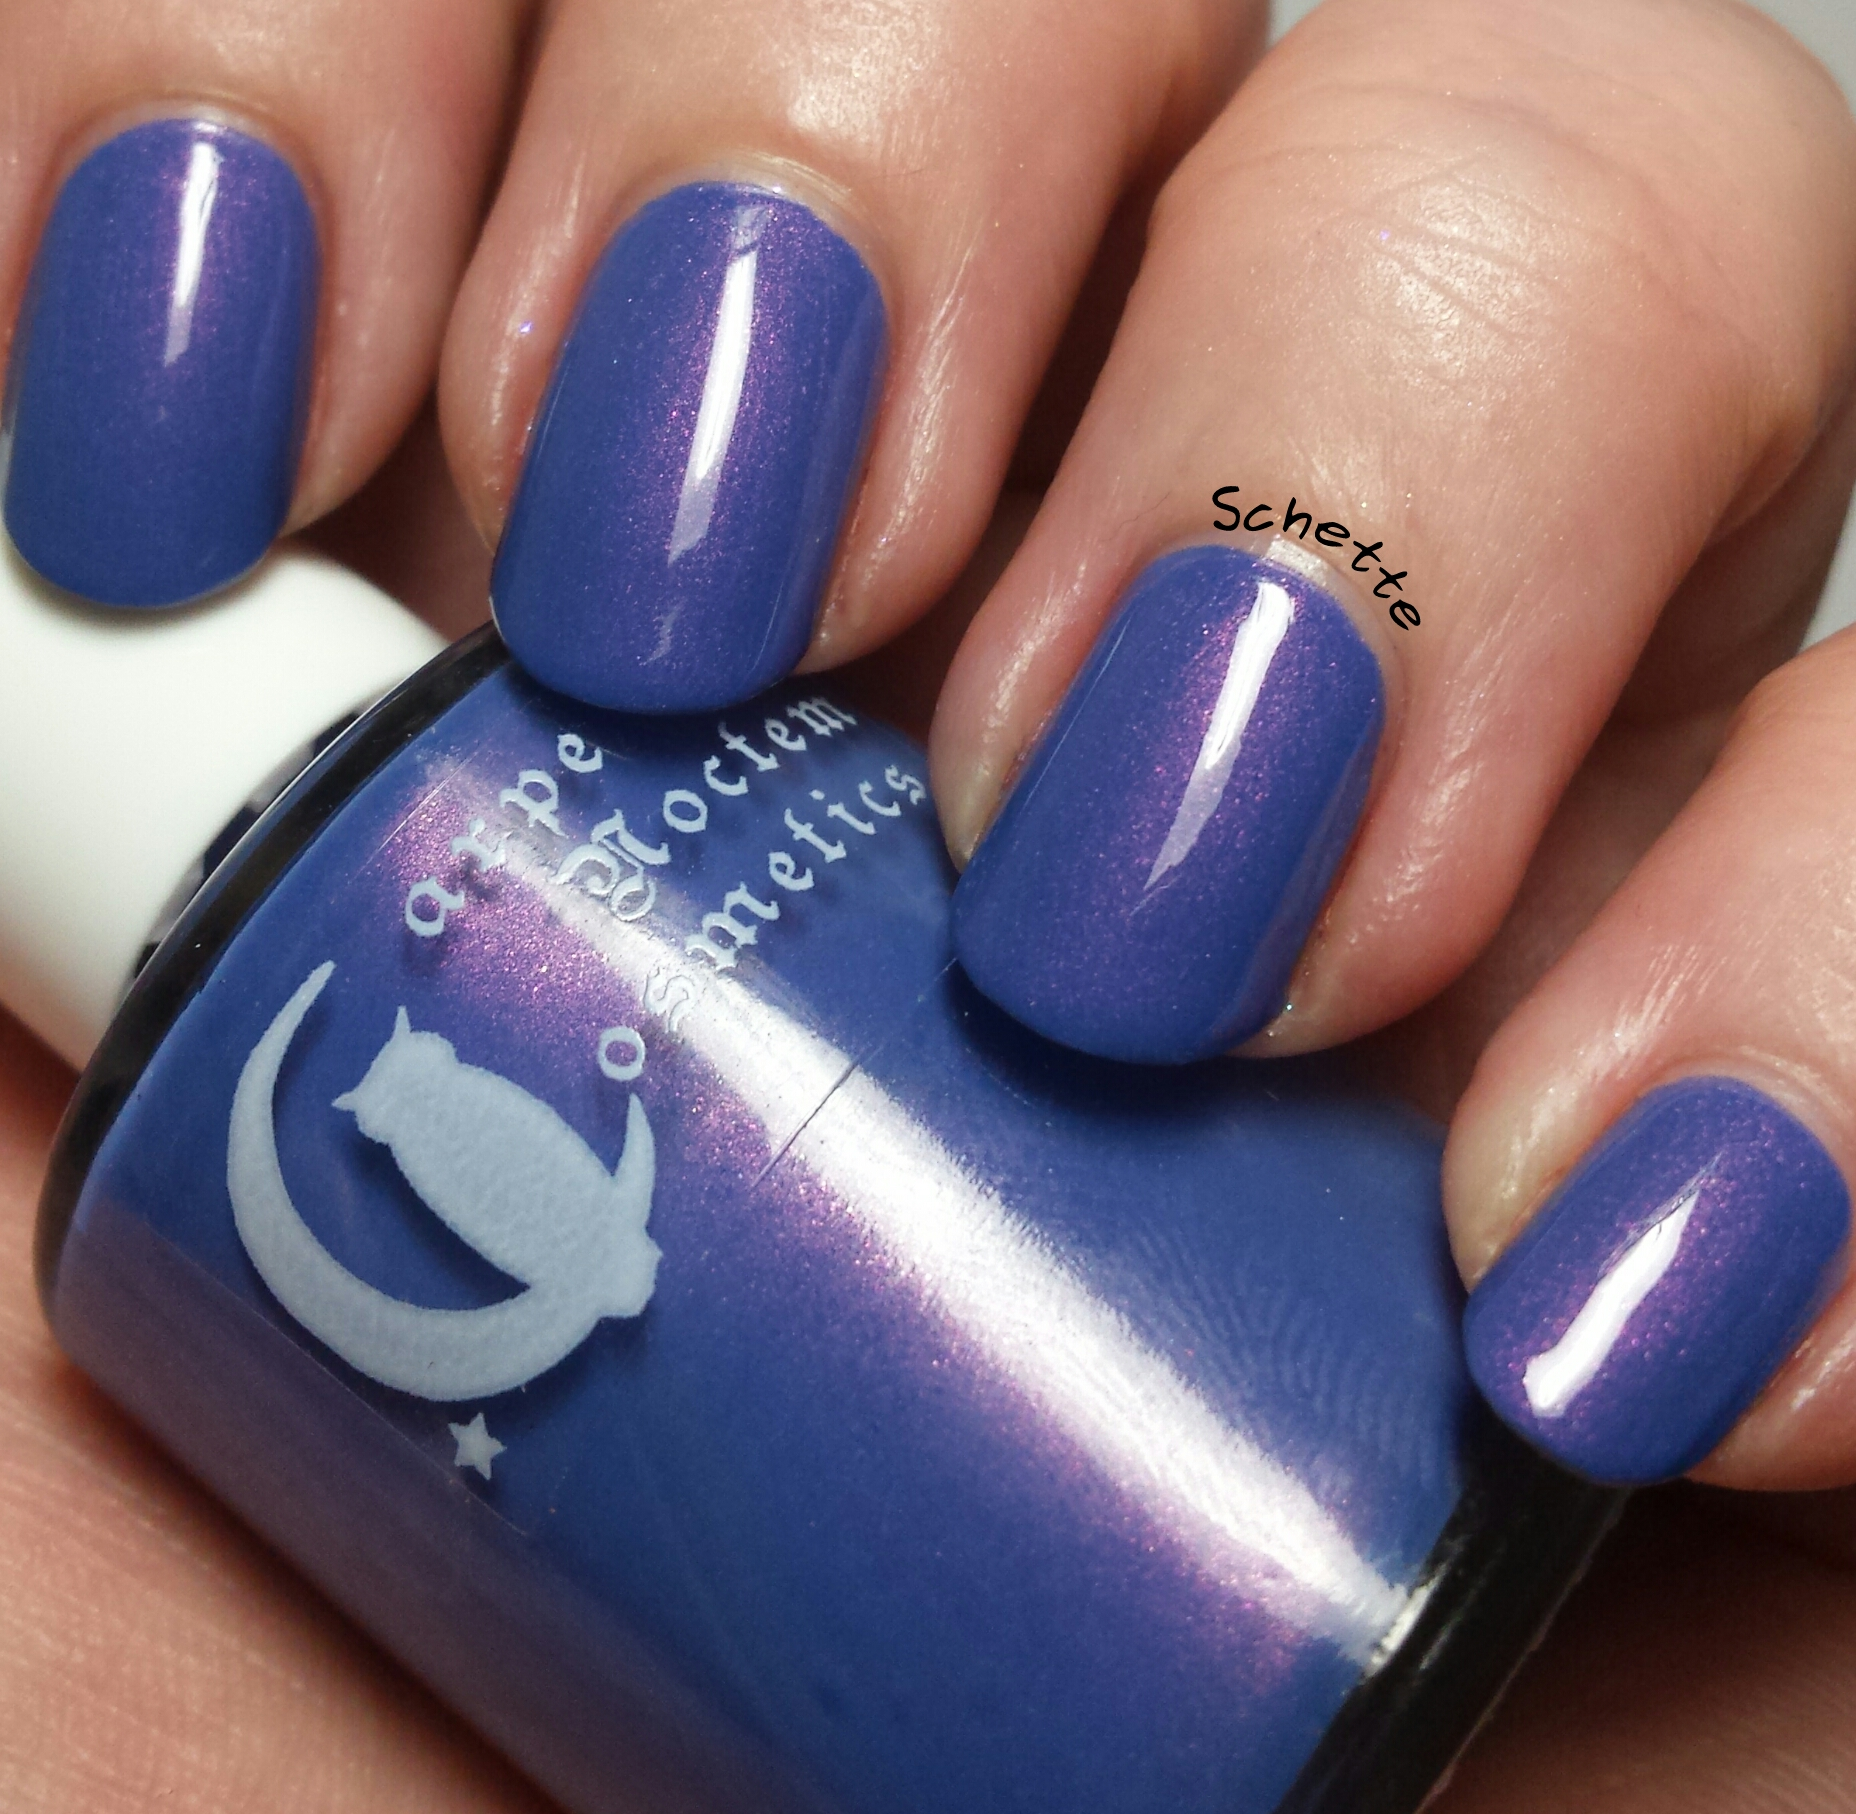 Carpe Noctem Cosmetics - DivaD in Diamonds - Pro Amico